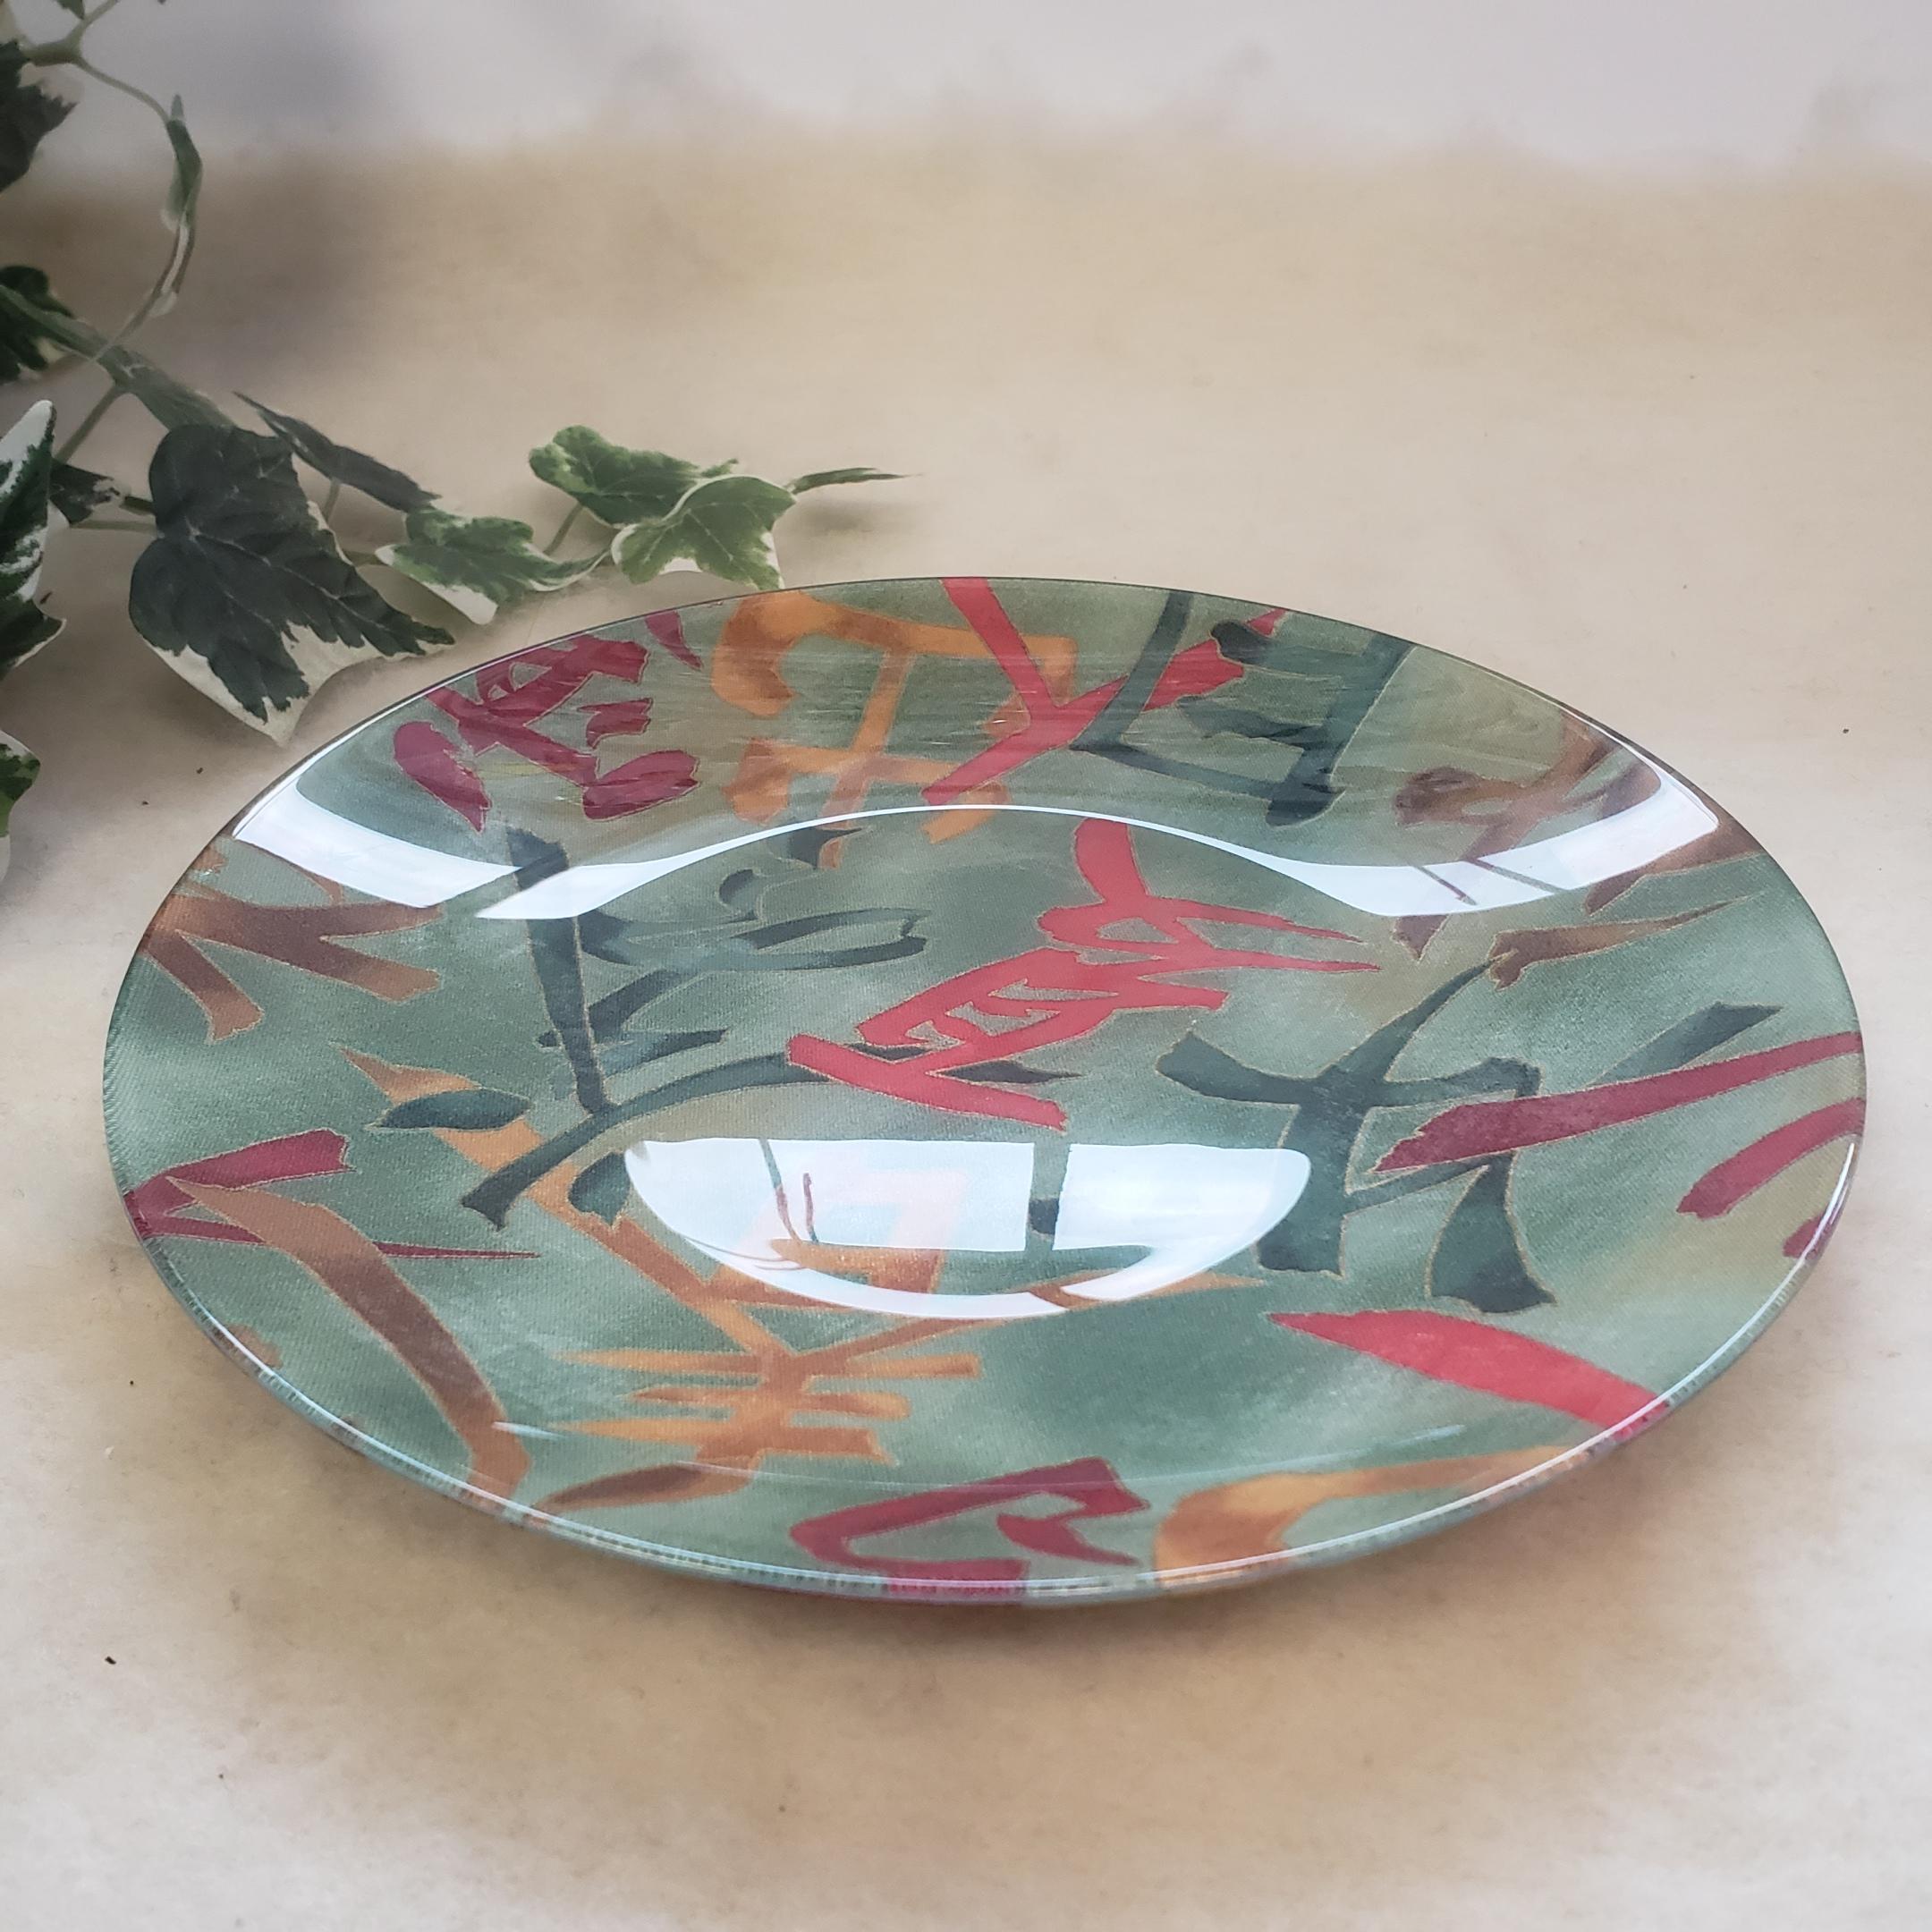 63-Decoupage Glass Dishware